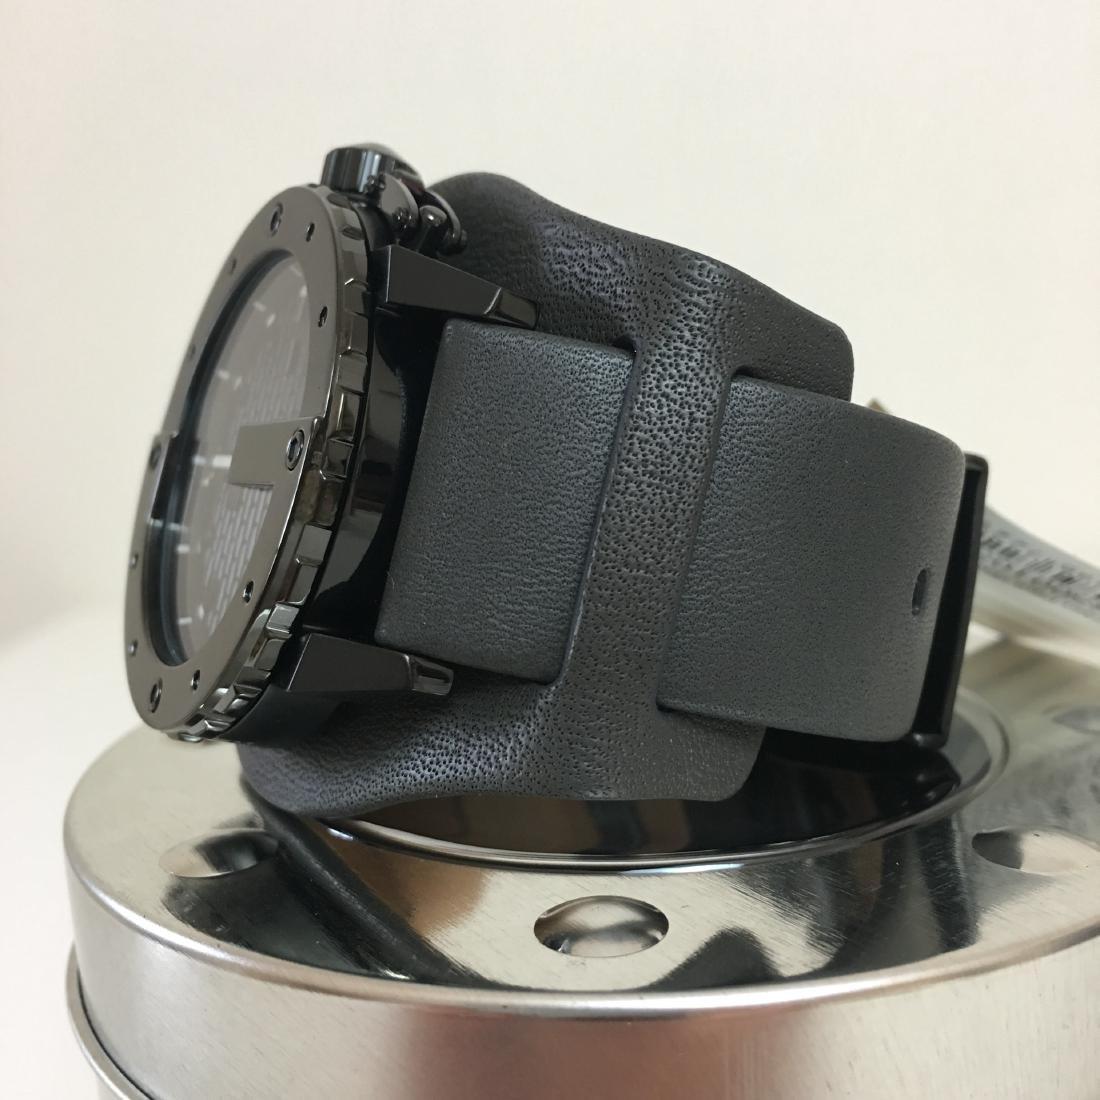 Jean Paul Gaultier – Men's Designer Wrist Watch - 4